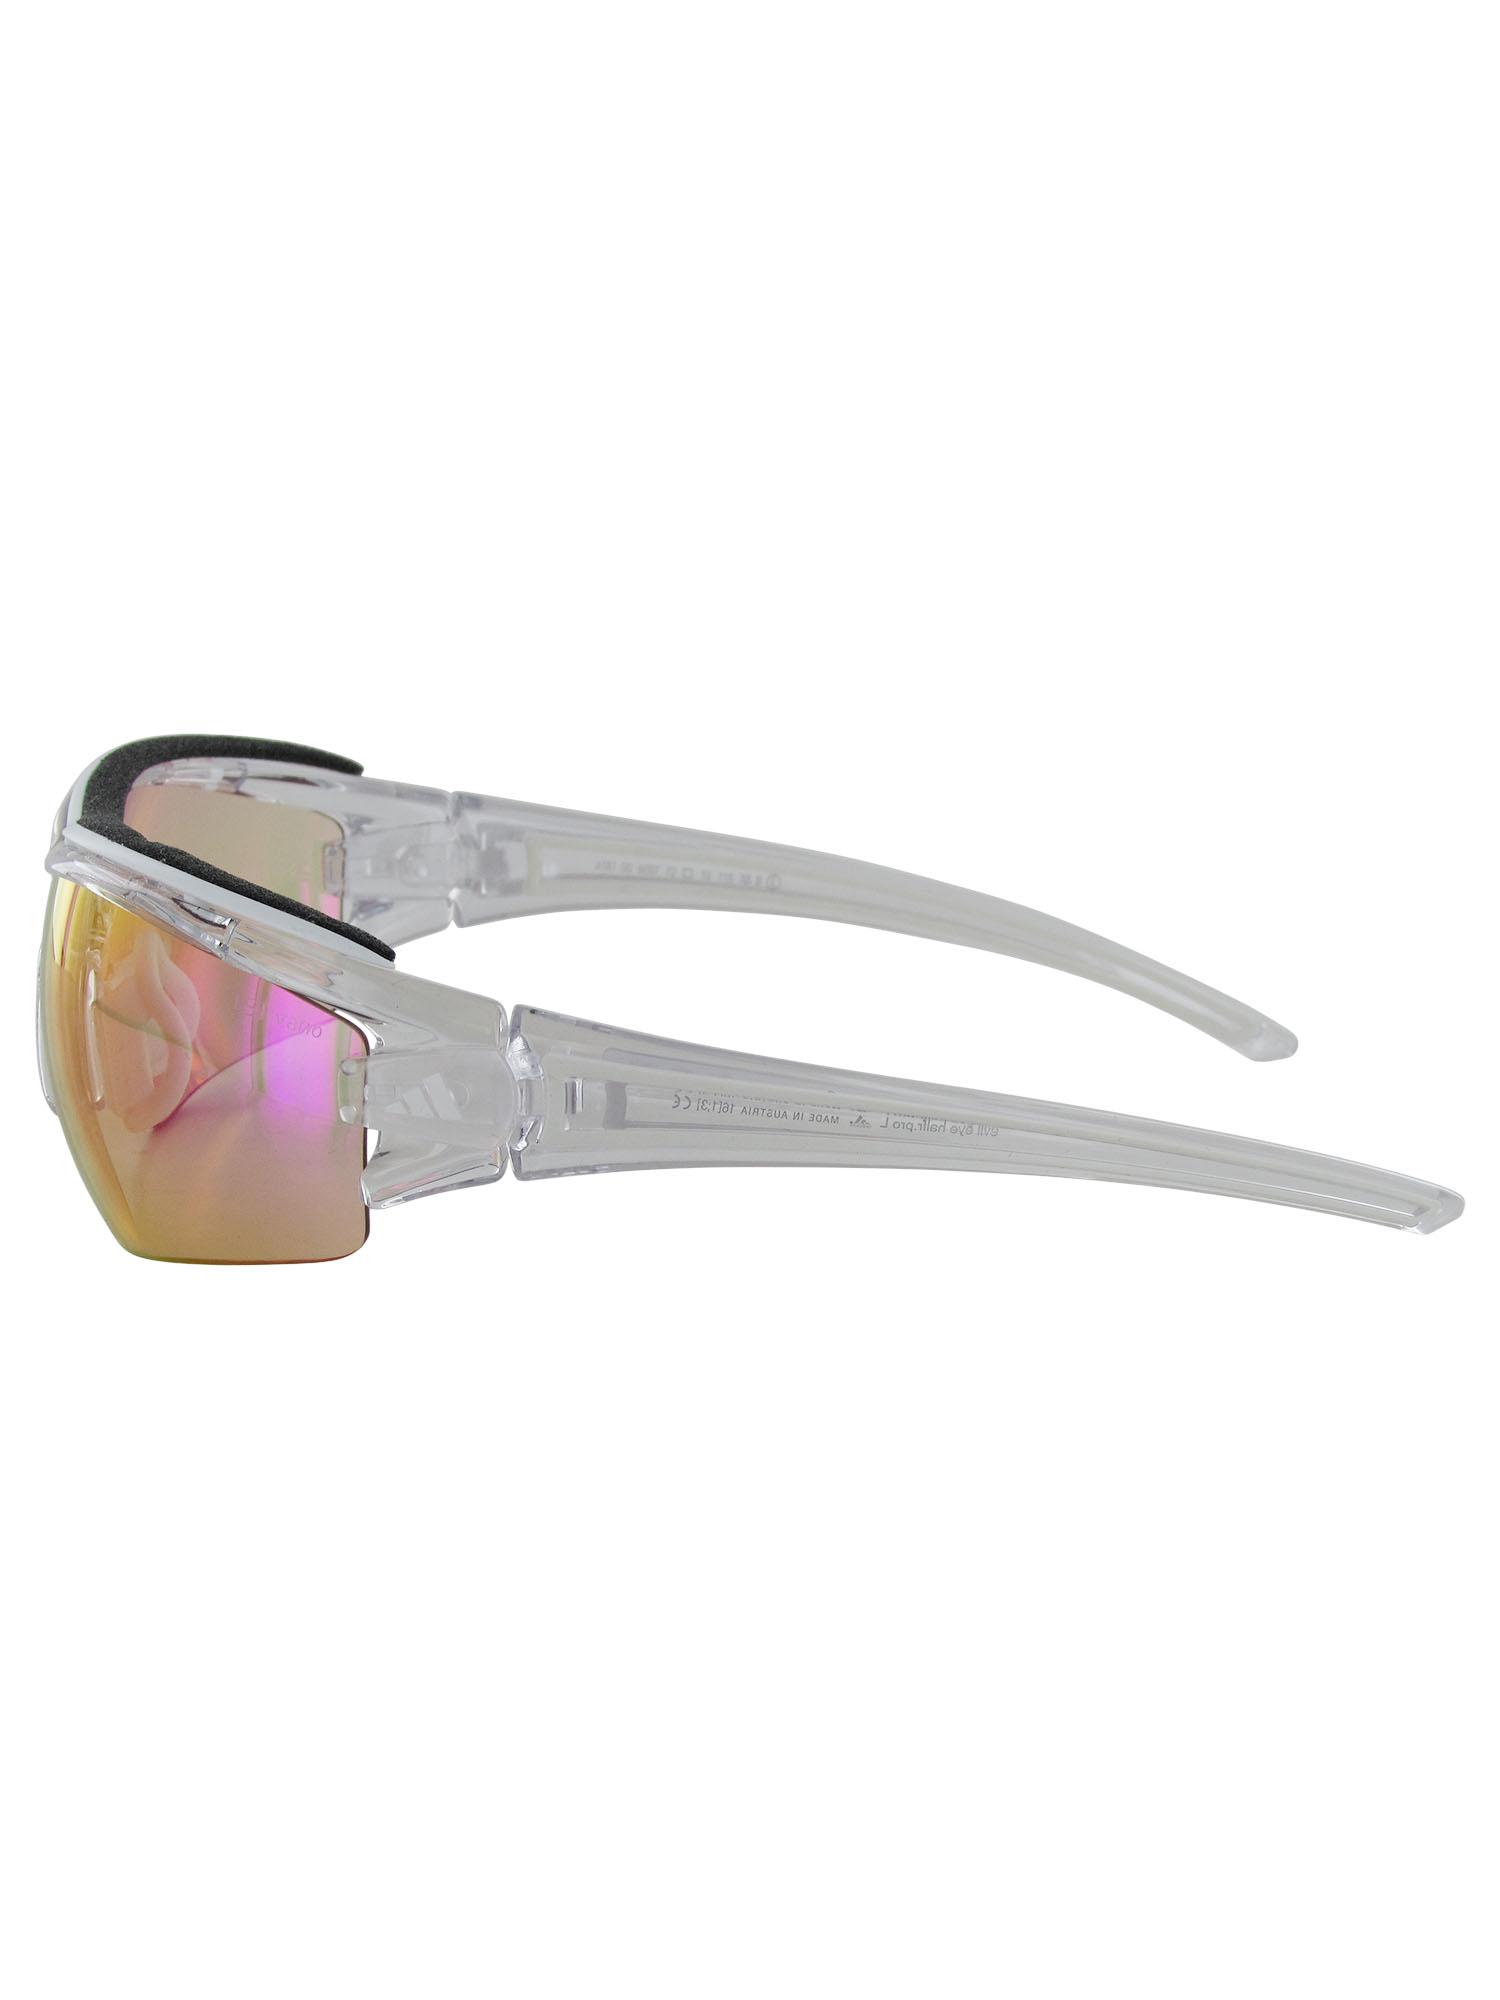 Adidas-Evil-Eye-Halfrim-Pro-XS-Sunglasses thumbnail 9